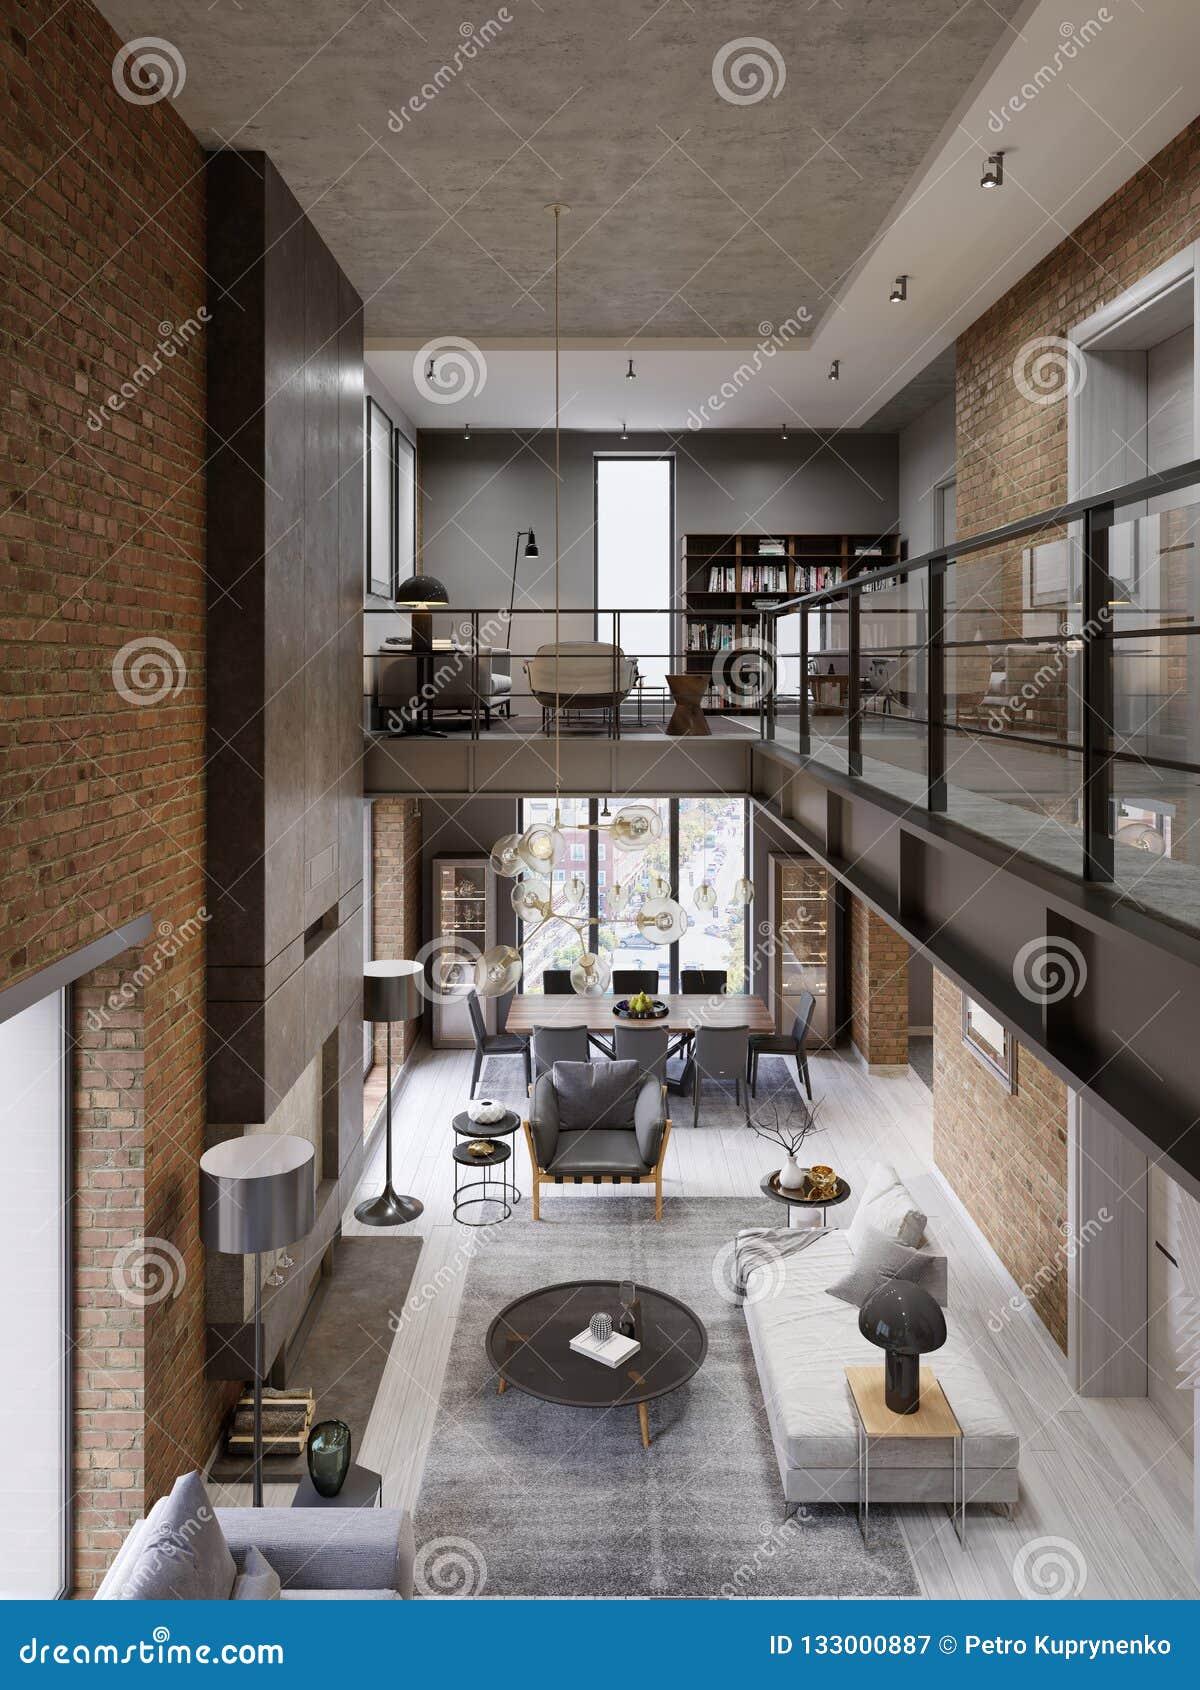 Loft Modern Interior Designed As A Open Plan Modern Apartment Open Plan Including Kitchen Dining Room Living Room Glass Stock Illustration Illustration Of Communication Leather 133000887